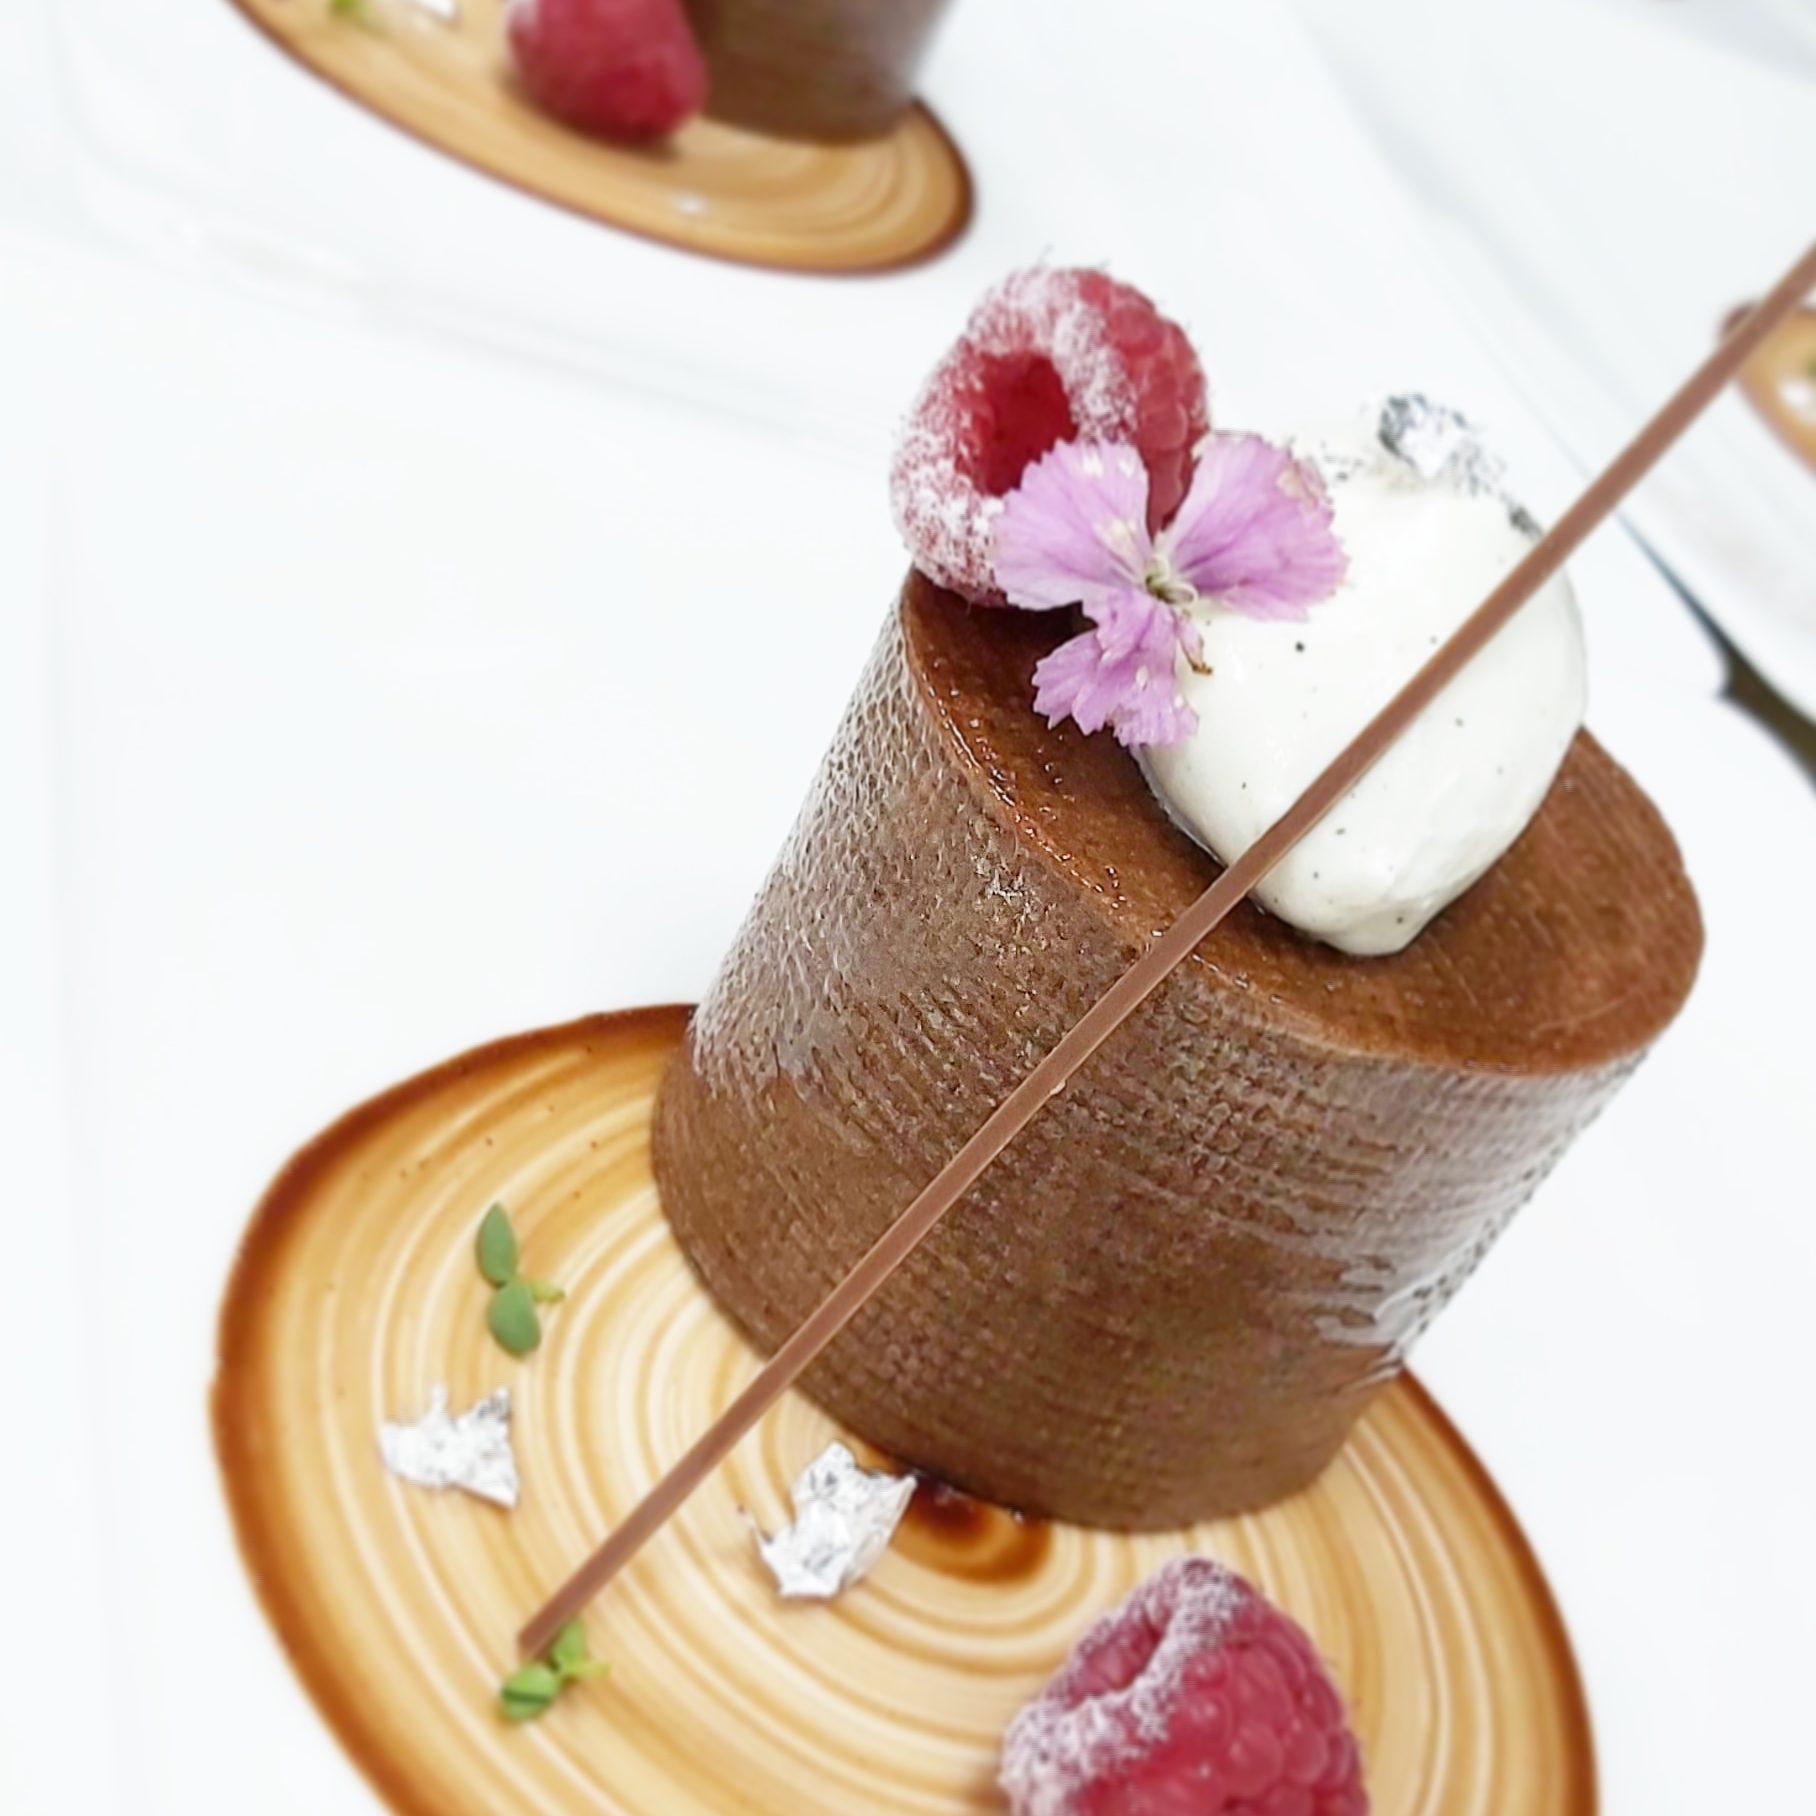 Favourite Choco Delight - Chocolate Hazelnut Soufflé Tart by Exec Pastry Chef Santosh Rawat, JW Marriott Mumbai Sahar